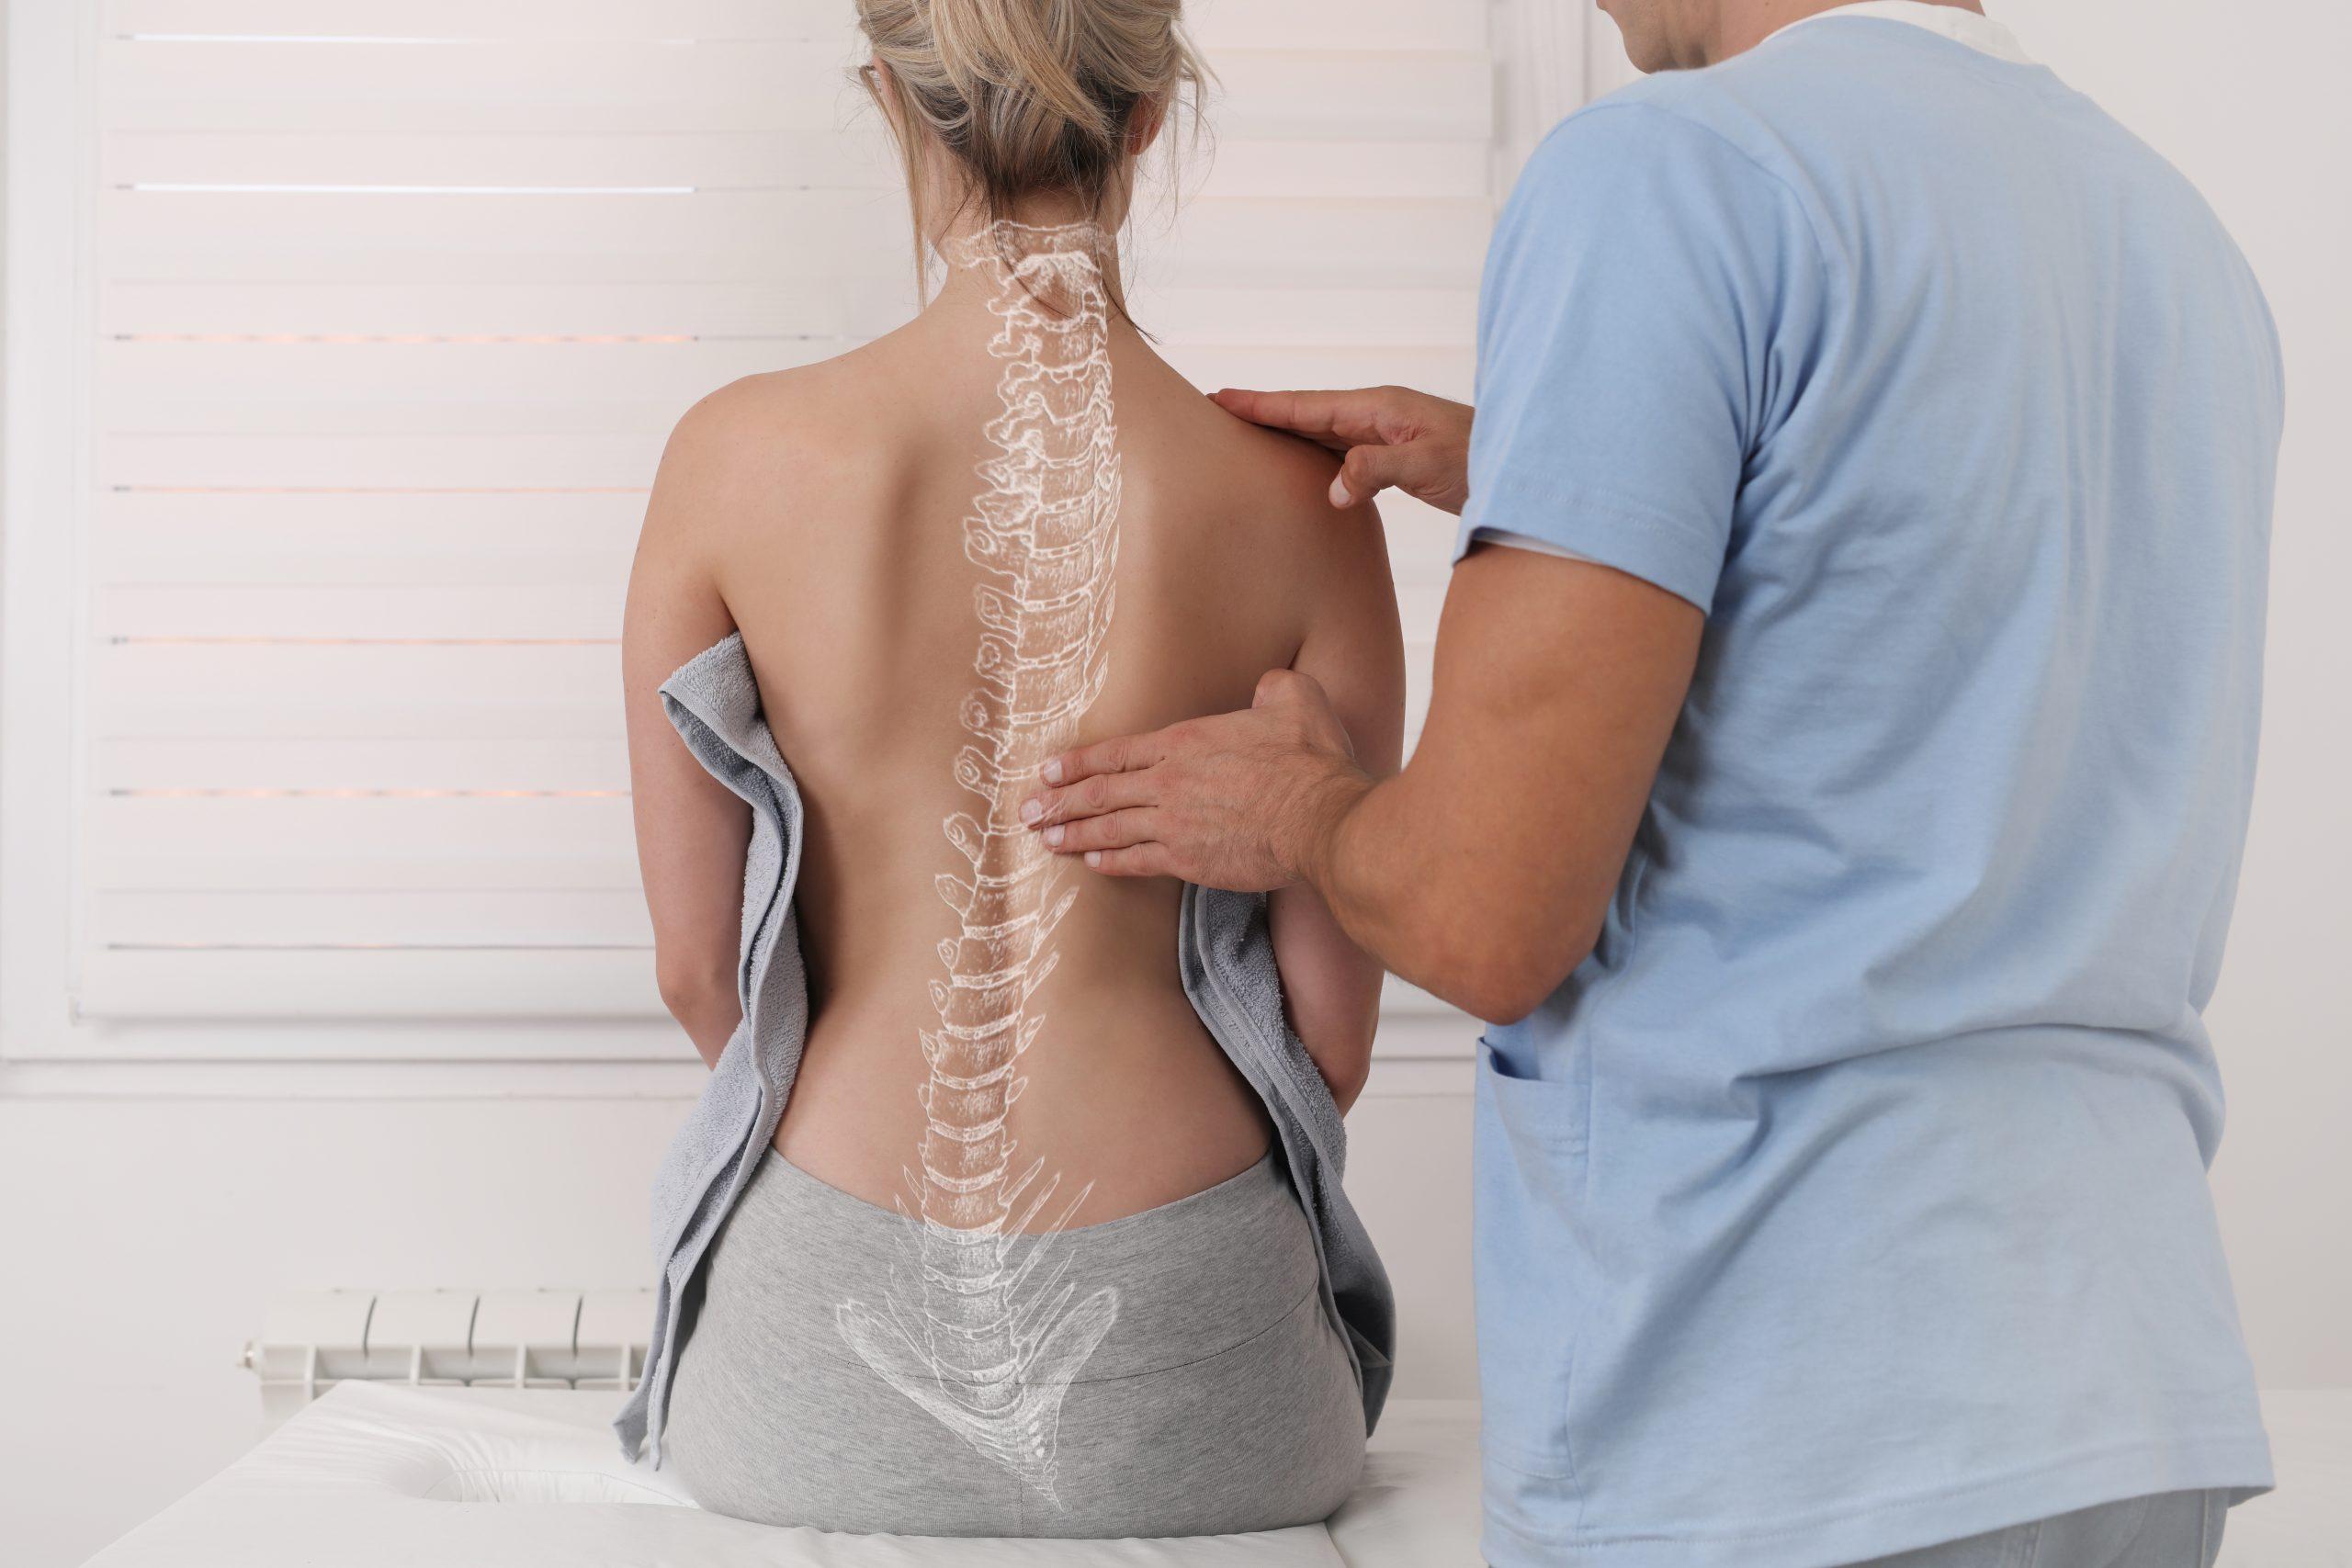 https://www.osteoporose-deutschland.de/wp-content/uploads/AdobeStock_297404141-scaled.jpeg